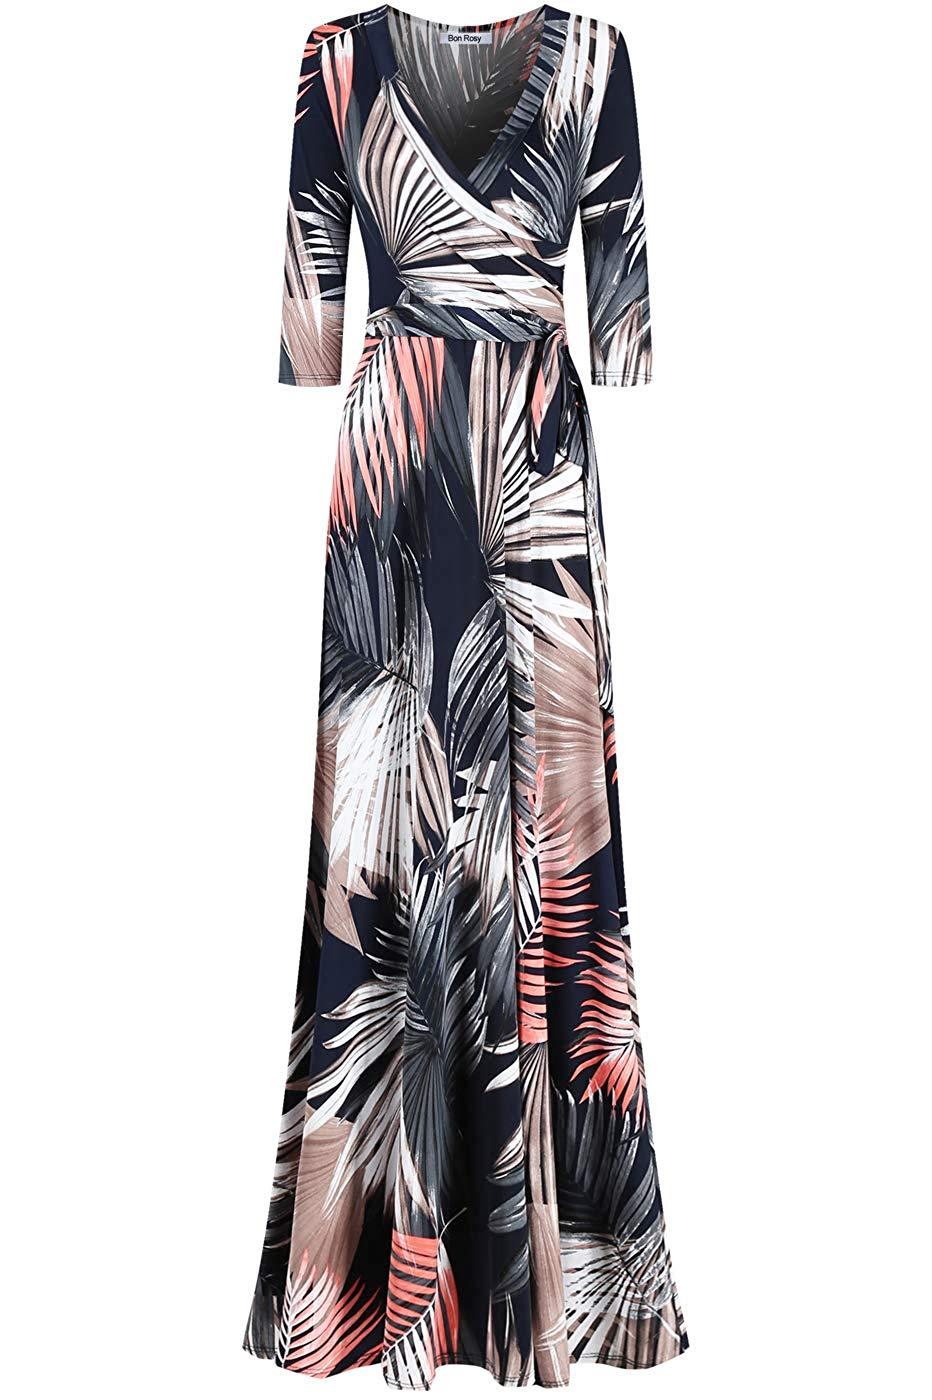 Amazon Com Bon Rosy Women S Madeinusa 3 4 Sleeve V Neck Printed Maxi Faux Wrap Floral Dress Clothing Printed Maxi Dresses Floral Dress [ 1400 x 932 Pixel ]